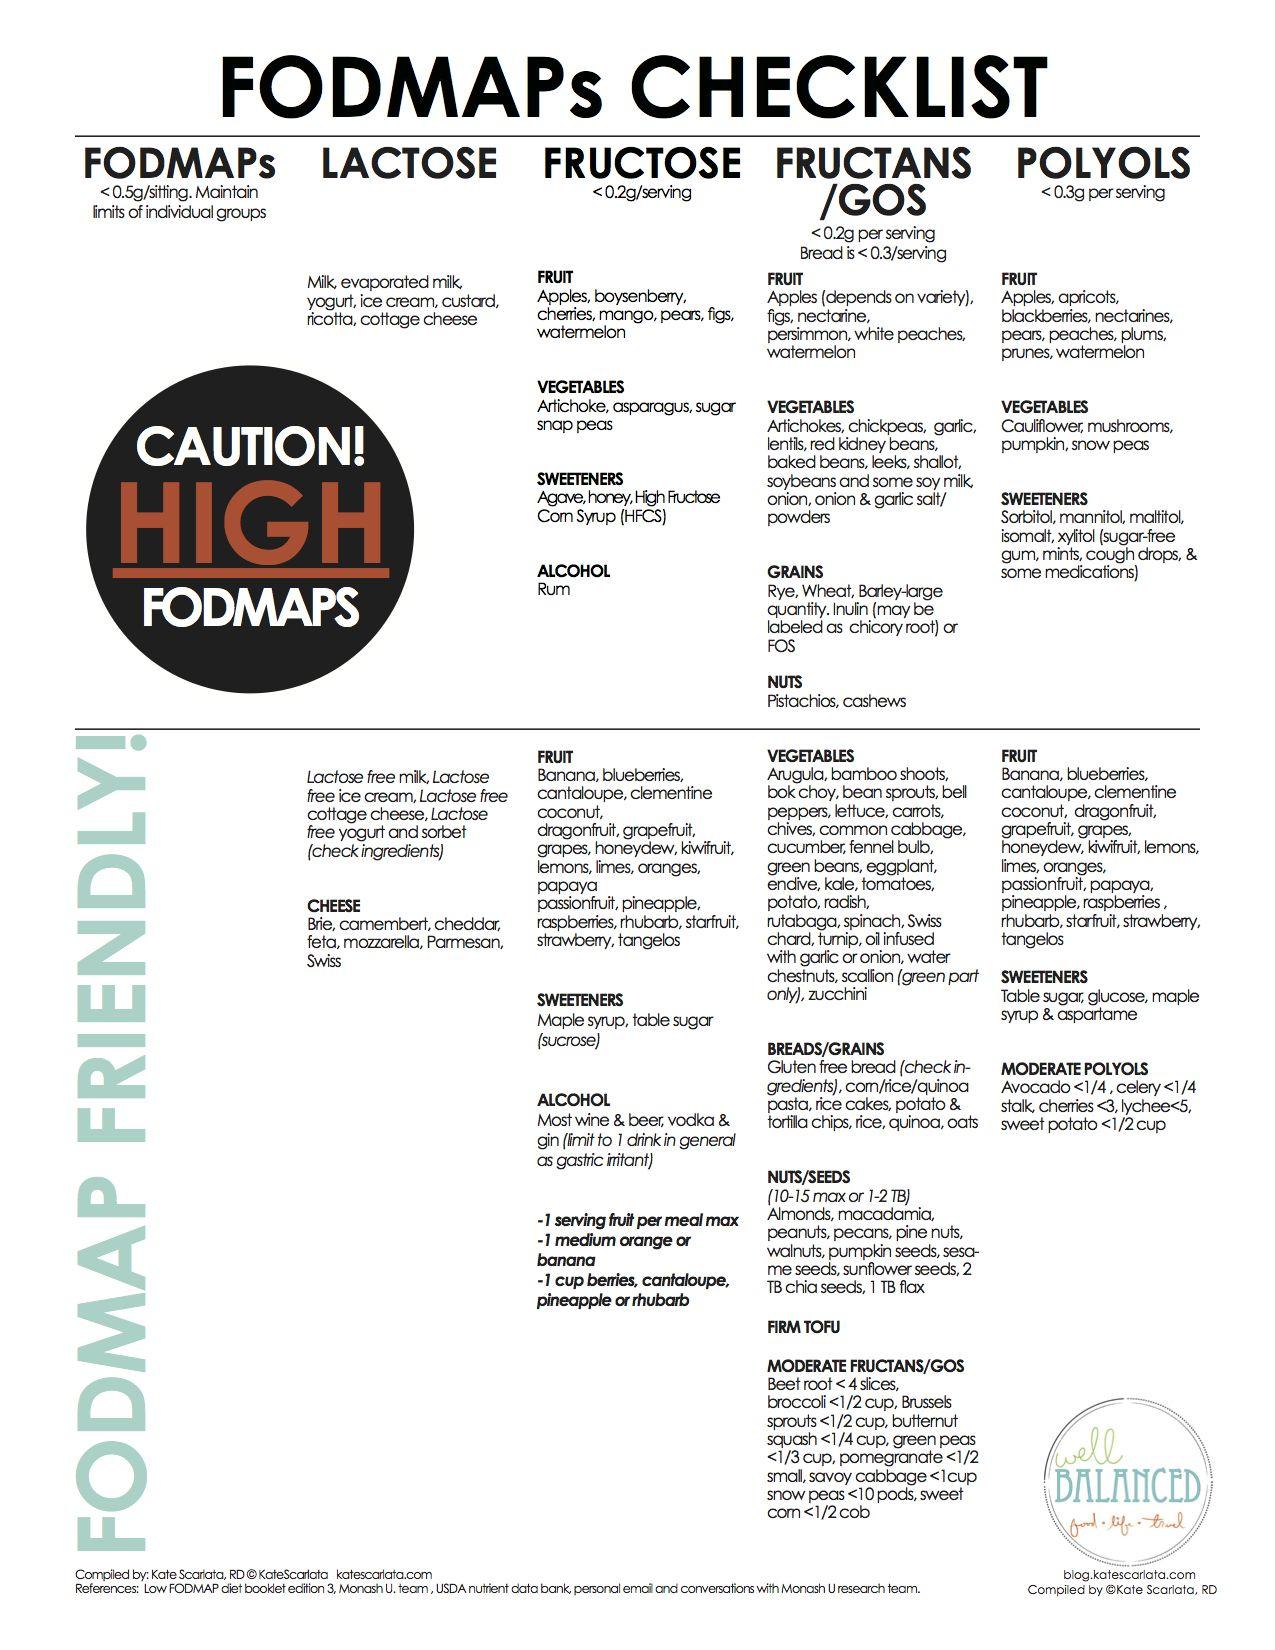 Fodmaps checklist fodmap low fodmap and fodmap diet fodmaps checklist fodmap dietlow publicscrutiny Choice Image